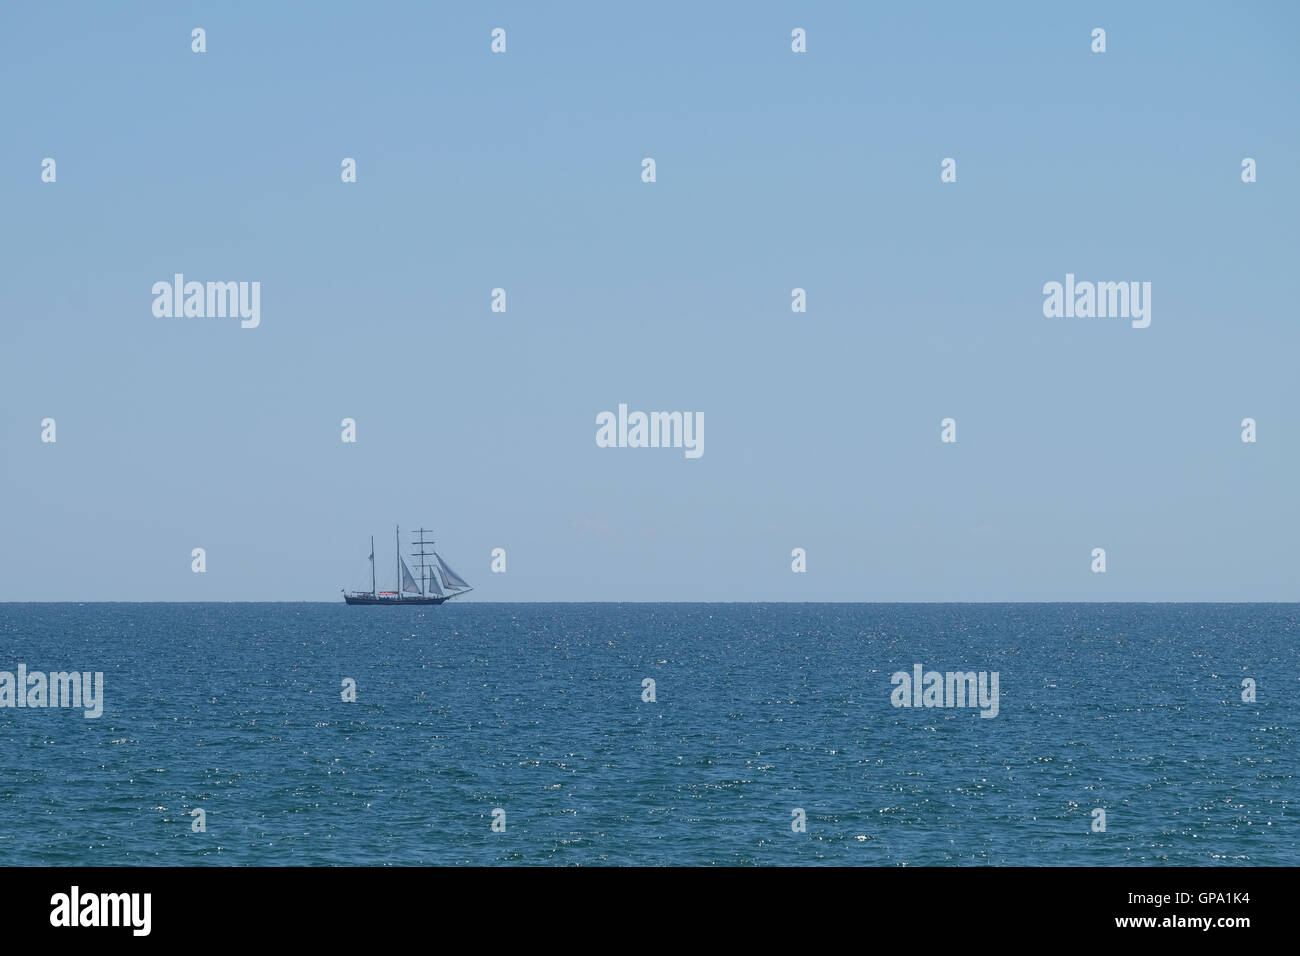 sailing yacht on horizon of blue sea - Stock Image